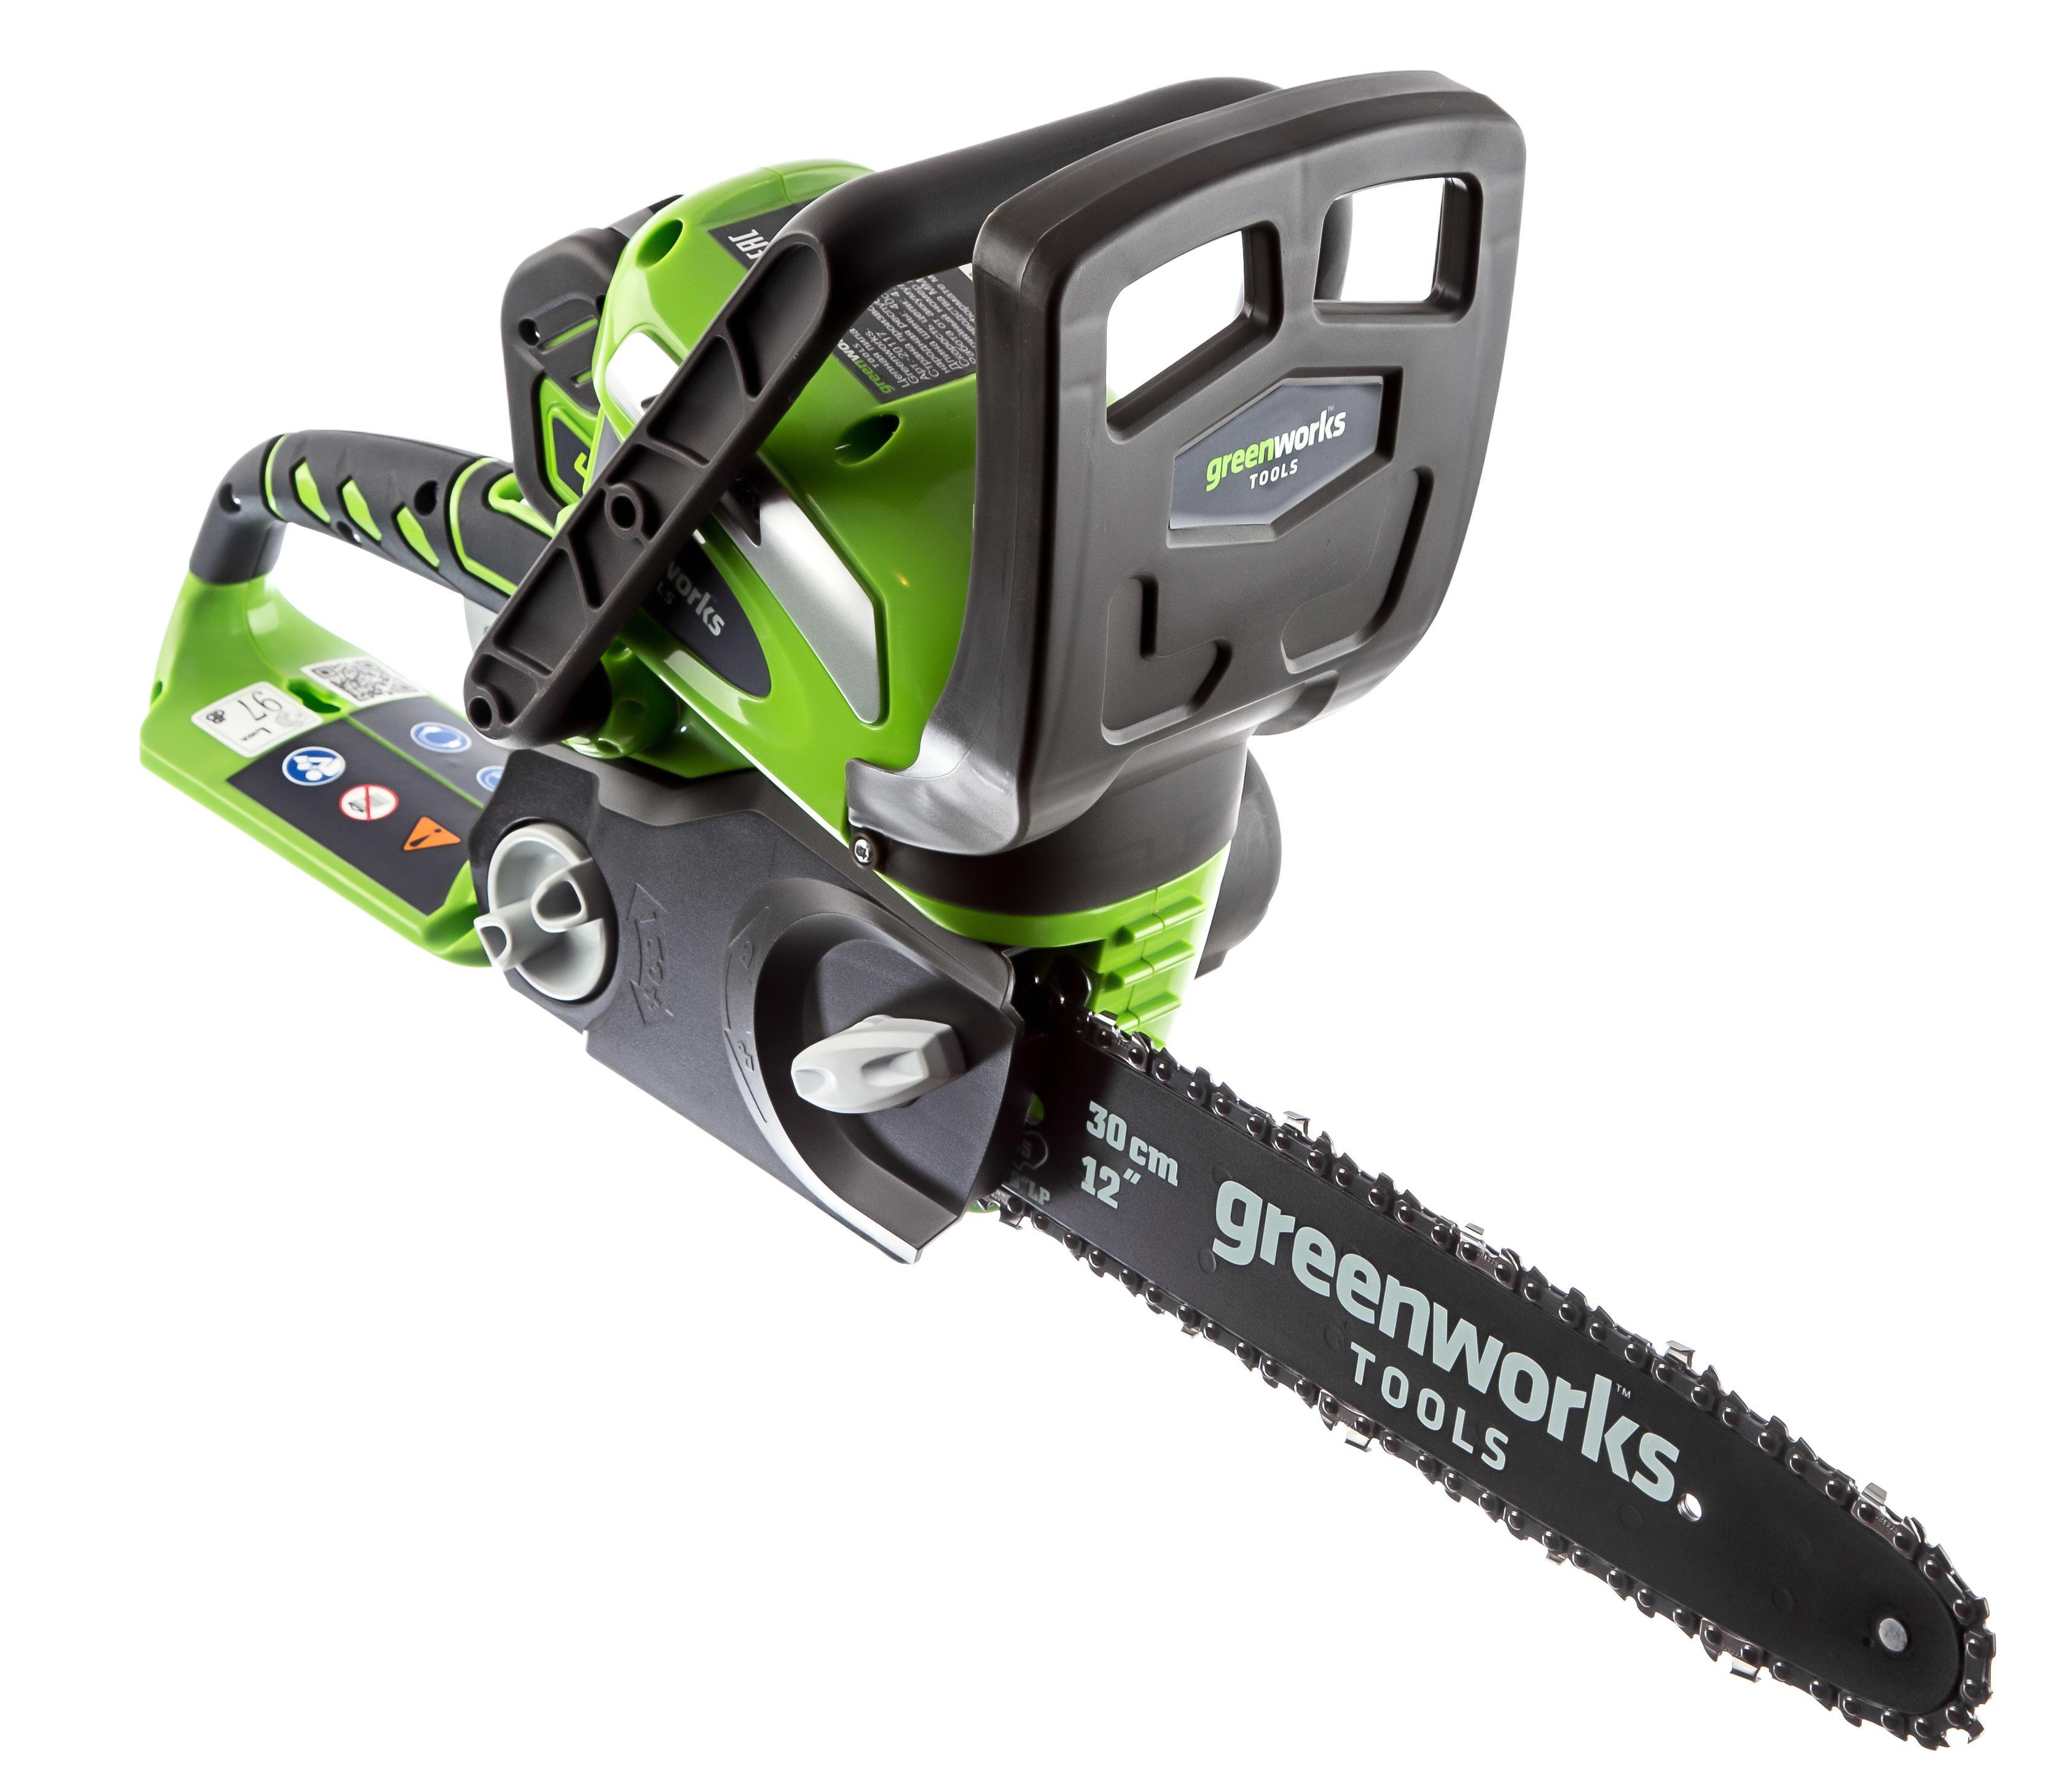 Пила цепная аккумуляторная Greenworks G40cs30k2 (20117ua) 1акк 40В 2Ач + ЗУ